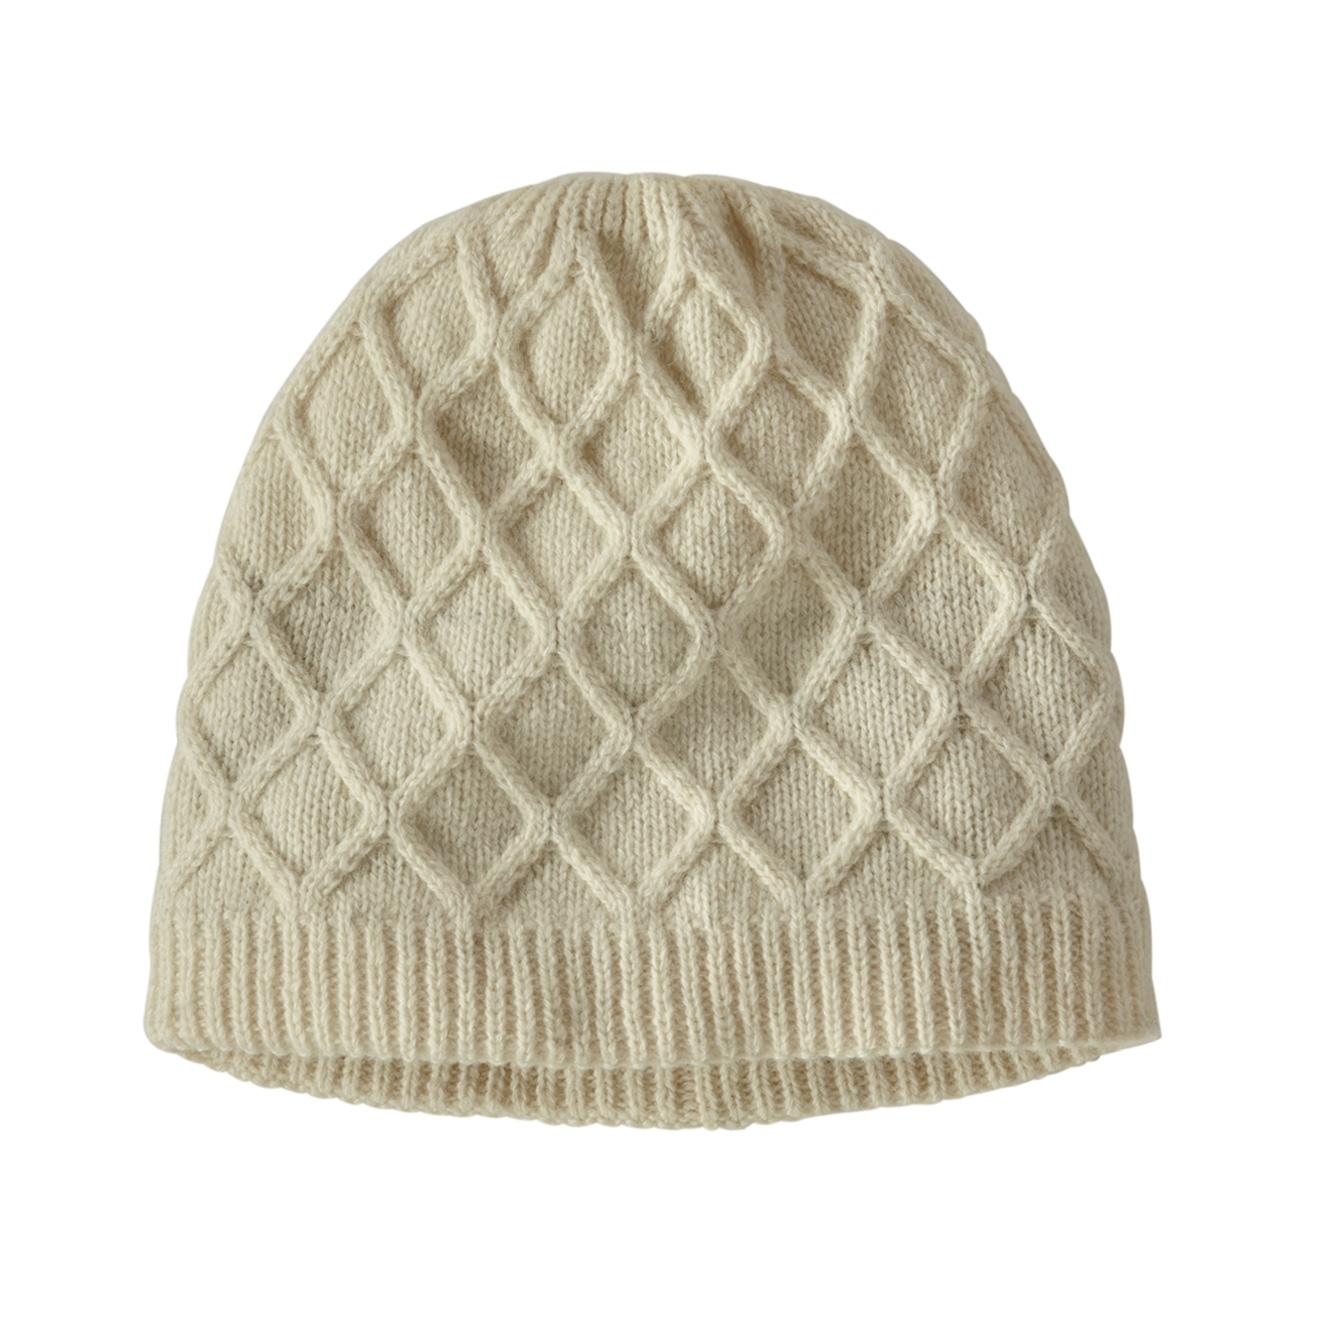 Patagonia Honeycomb Knit Beanie Birch White 2021